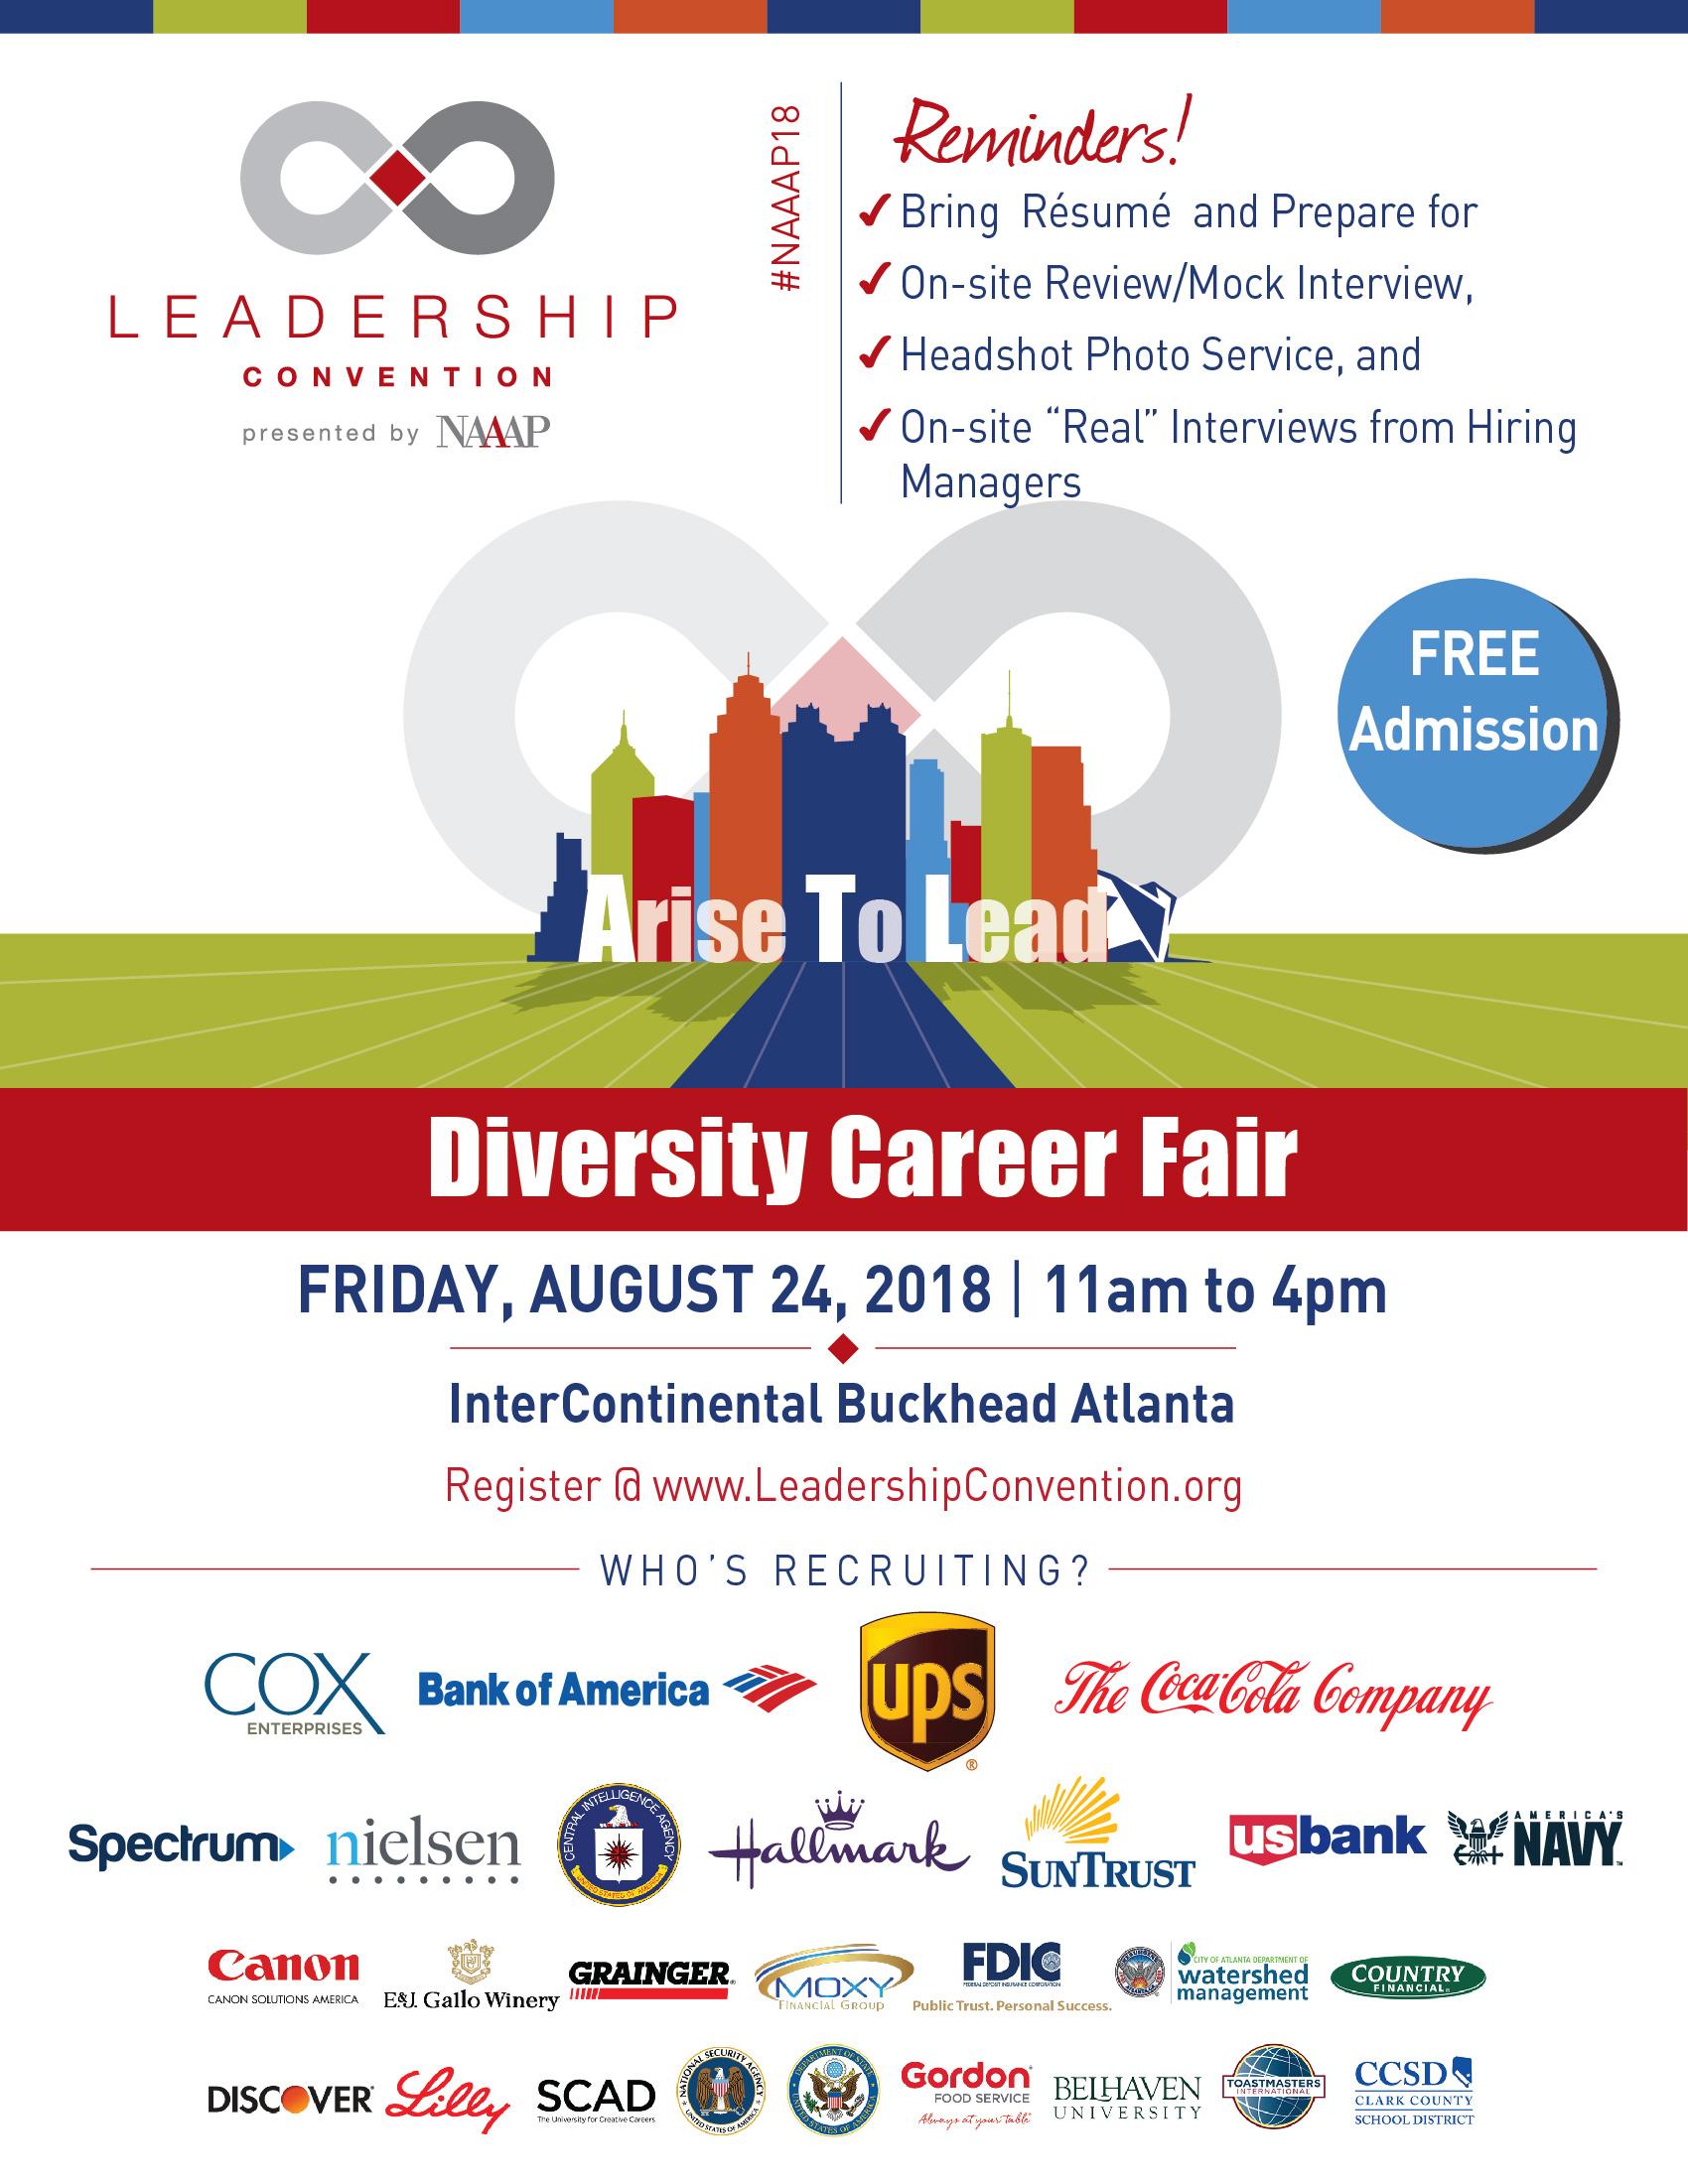 NAAAP Diversity Career Fair